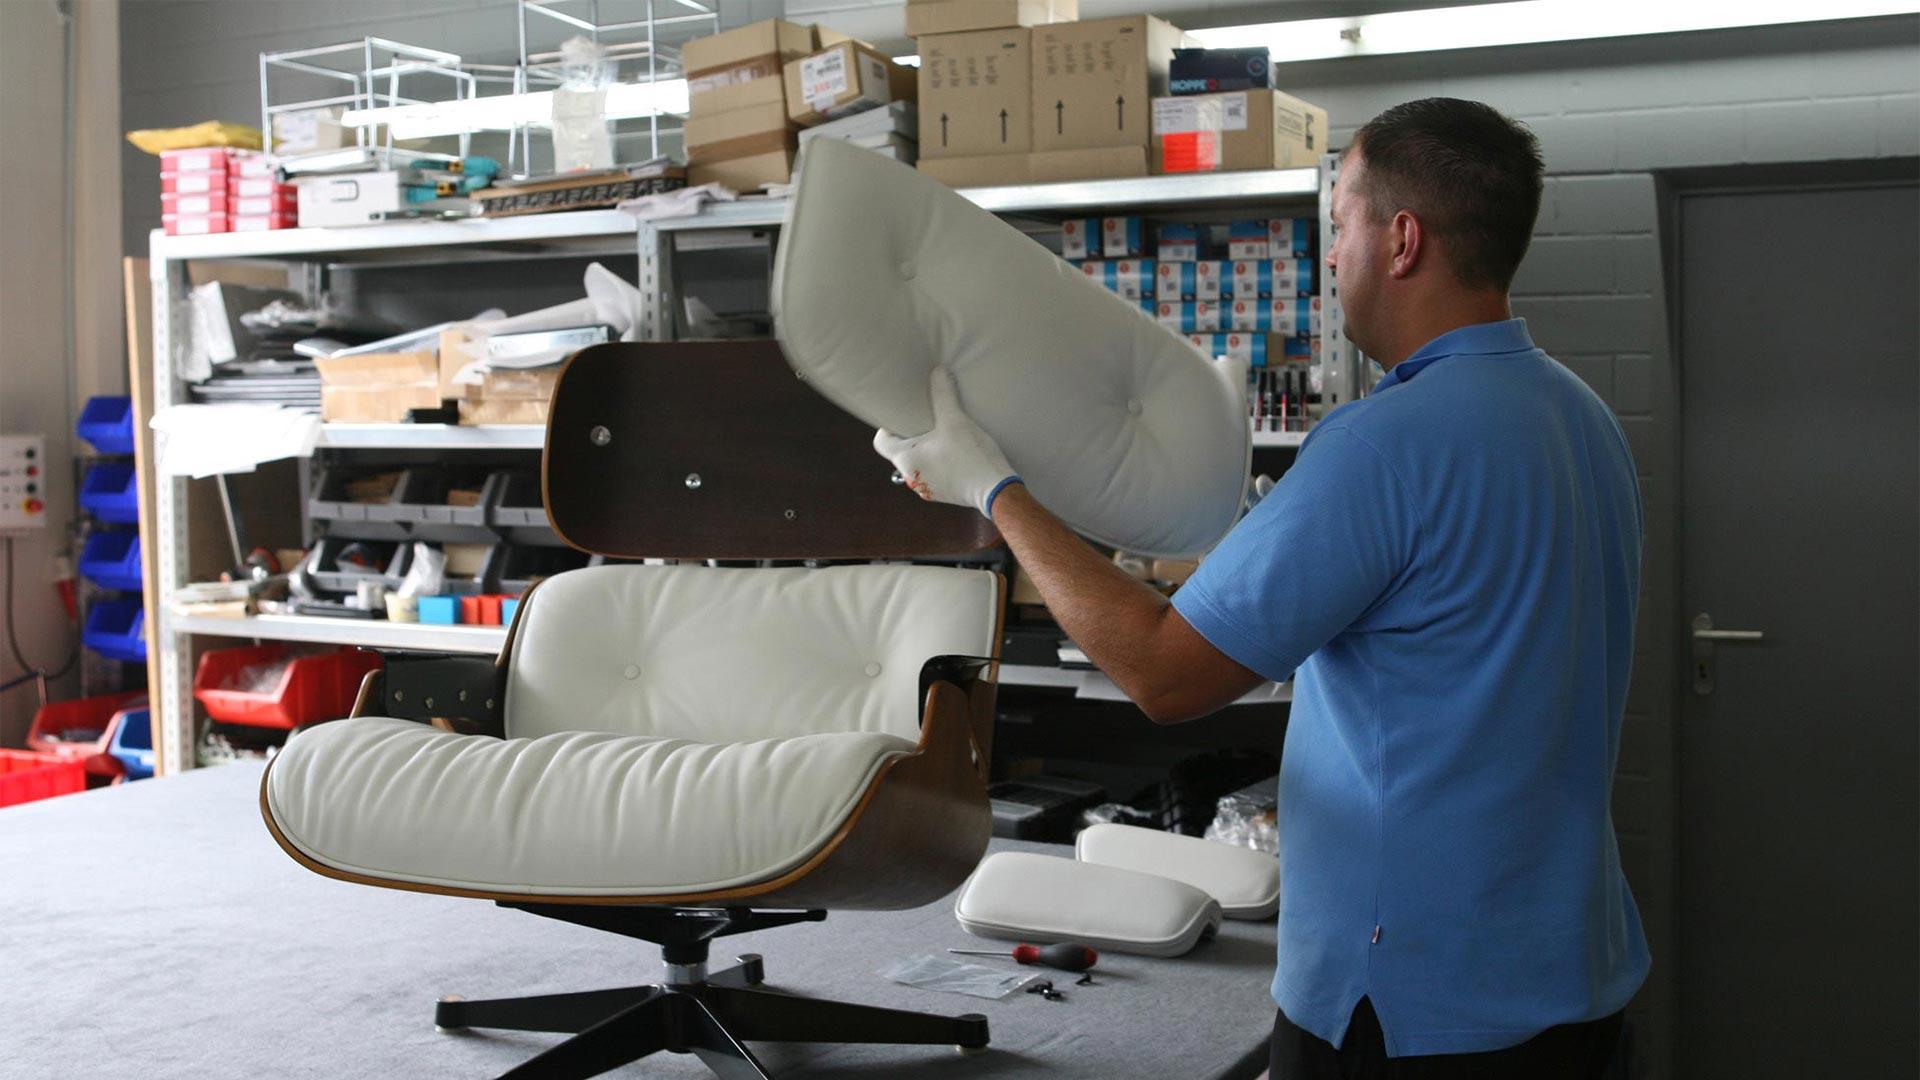 Reparatur Vitra Eames Lounge Chair Ersatzteile in Berlin bei steiden+05